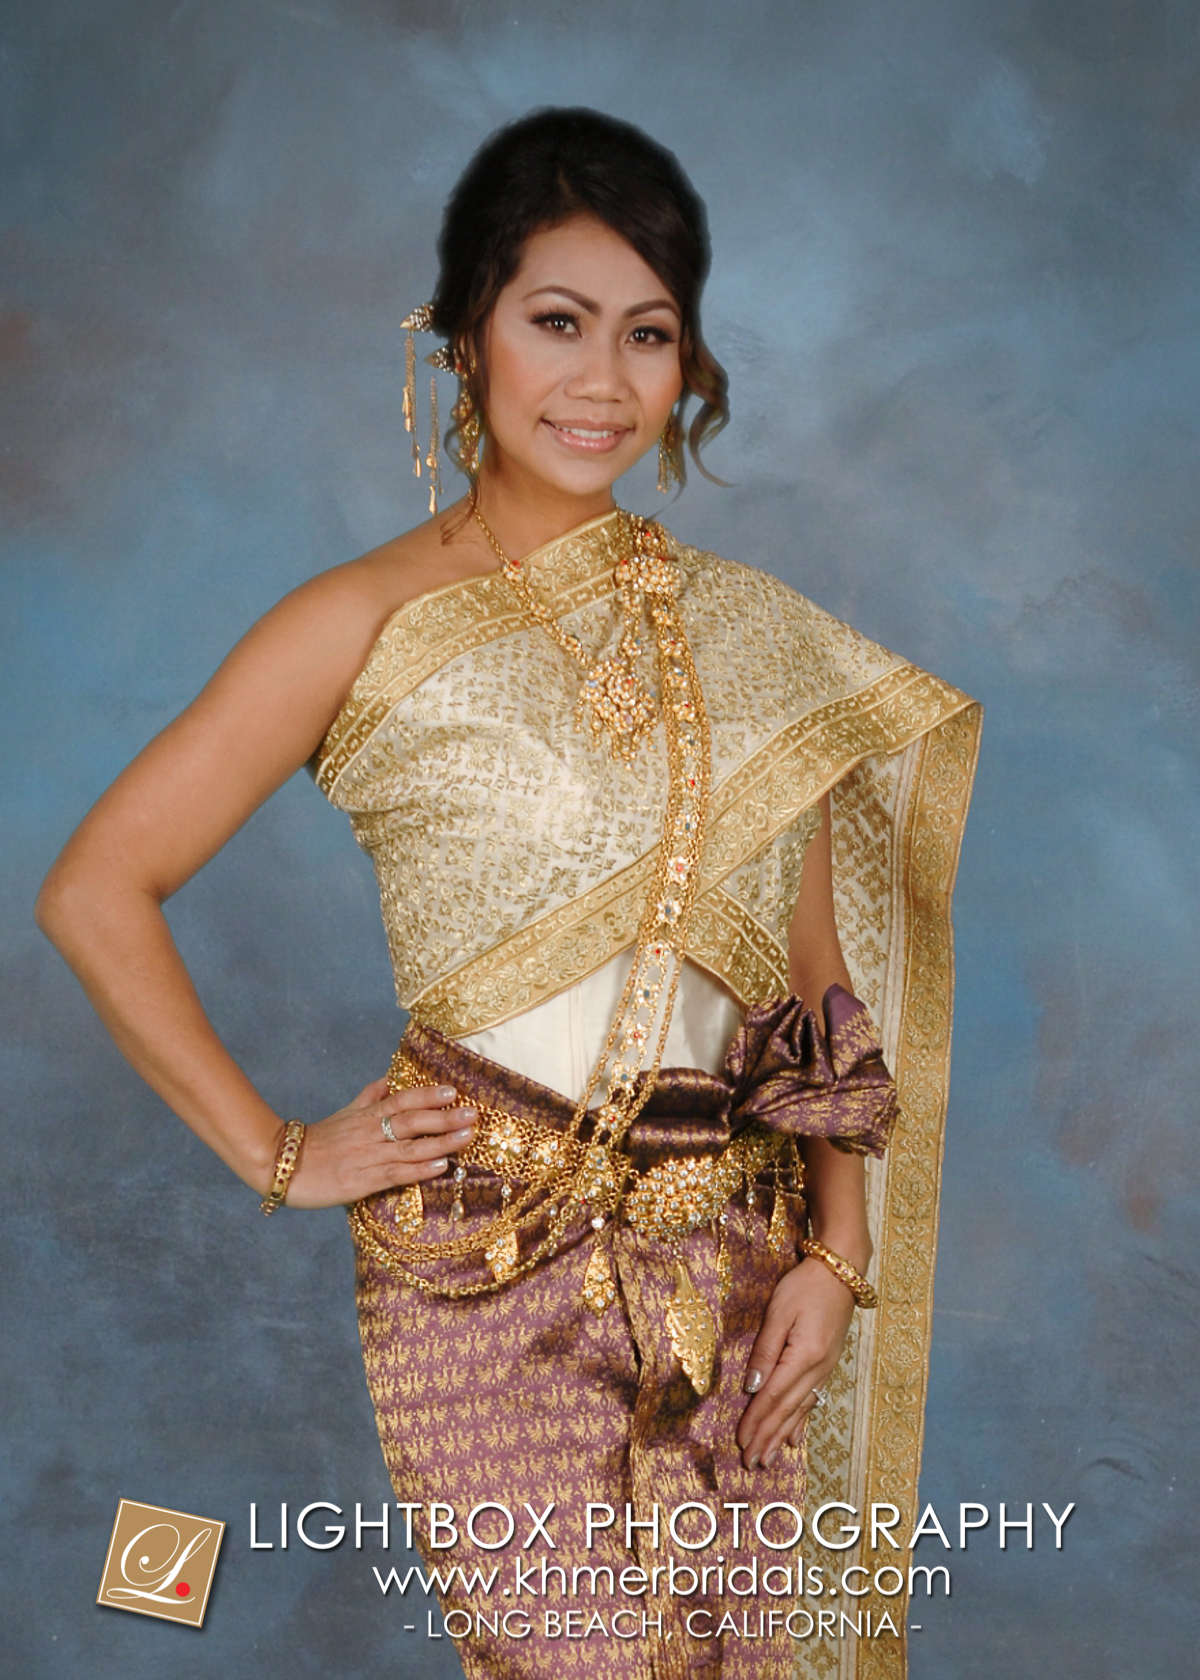 Apsara Khmer Bridal Wedding Photography and video-218-2.jpg